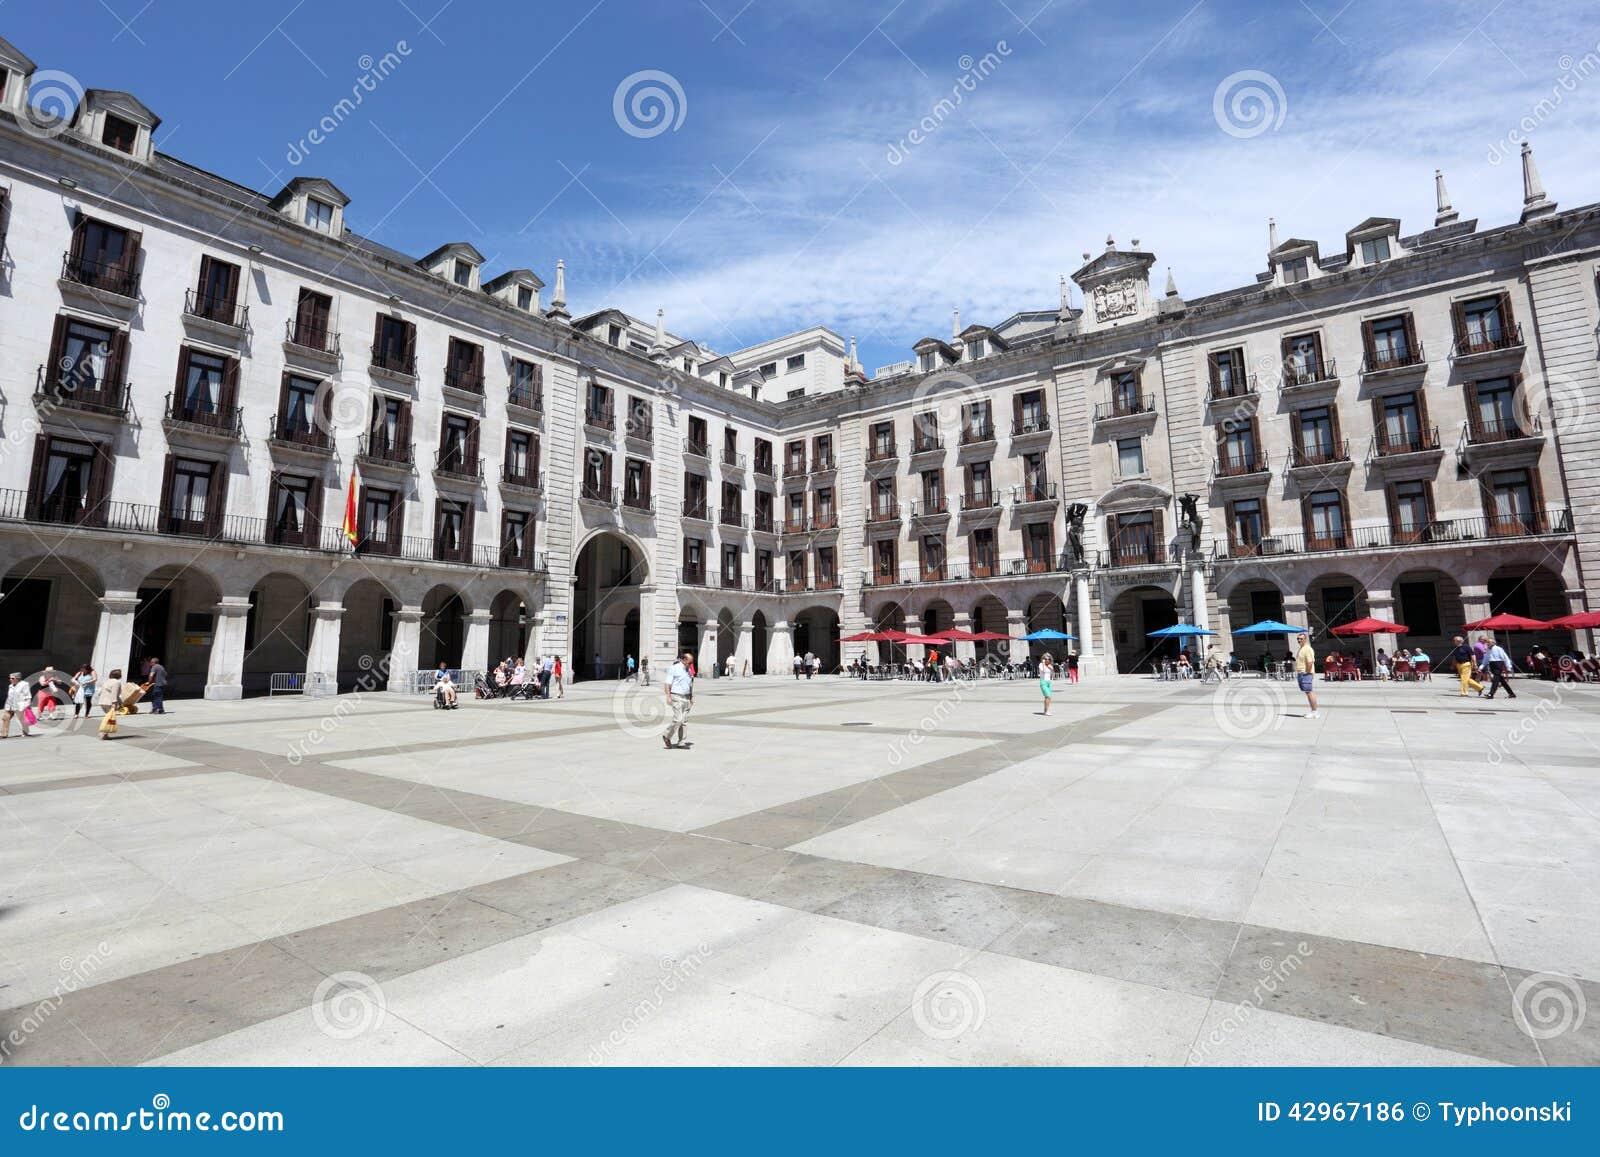 Plaza porticada in santander spain editorial photo - Be up santander ...